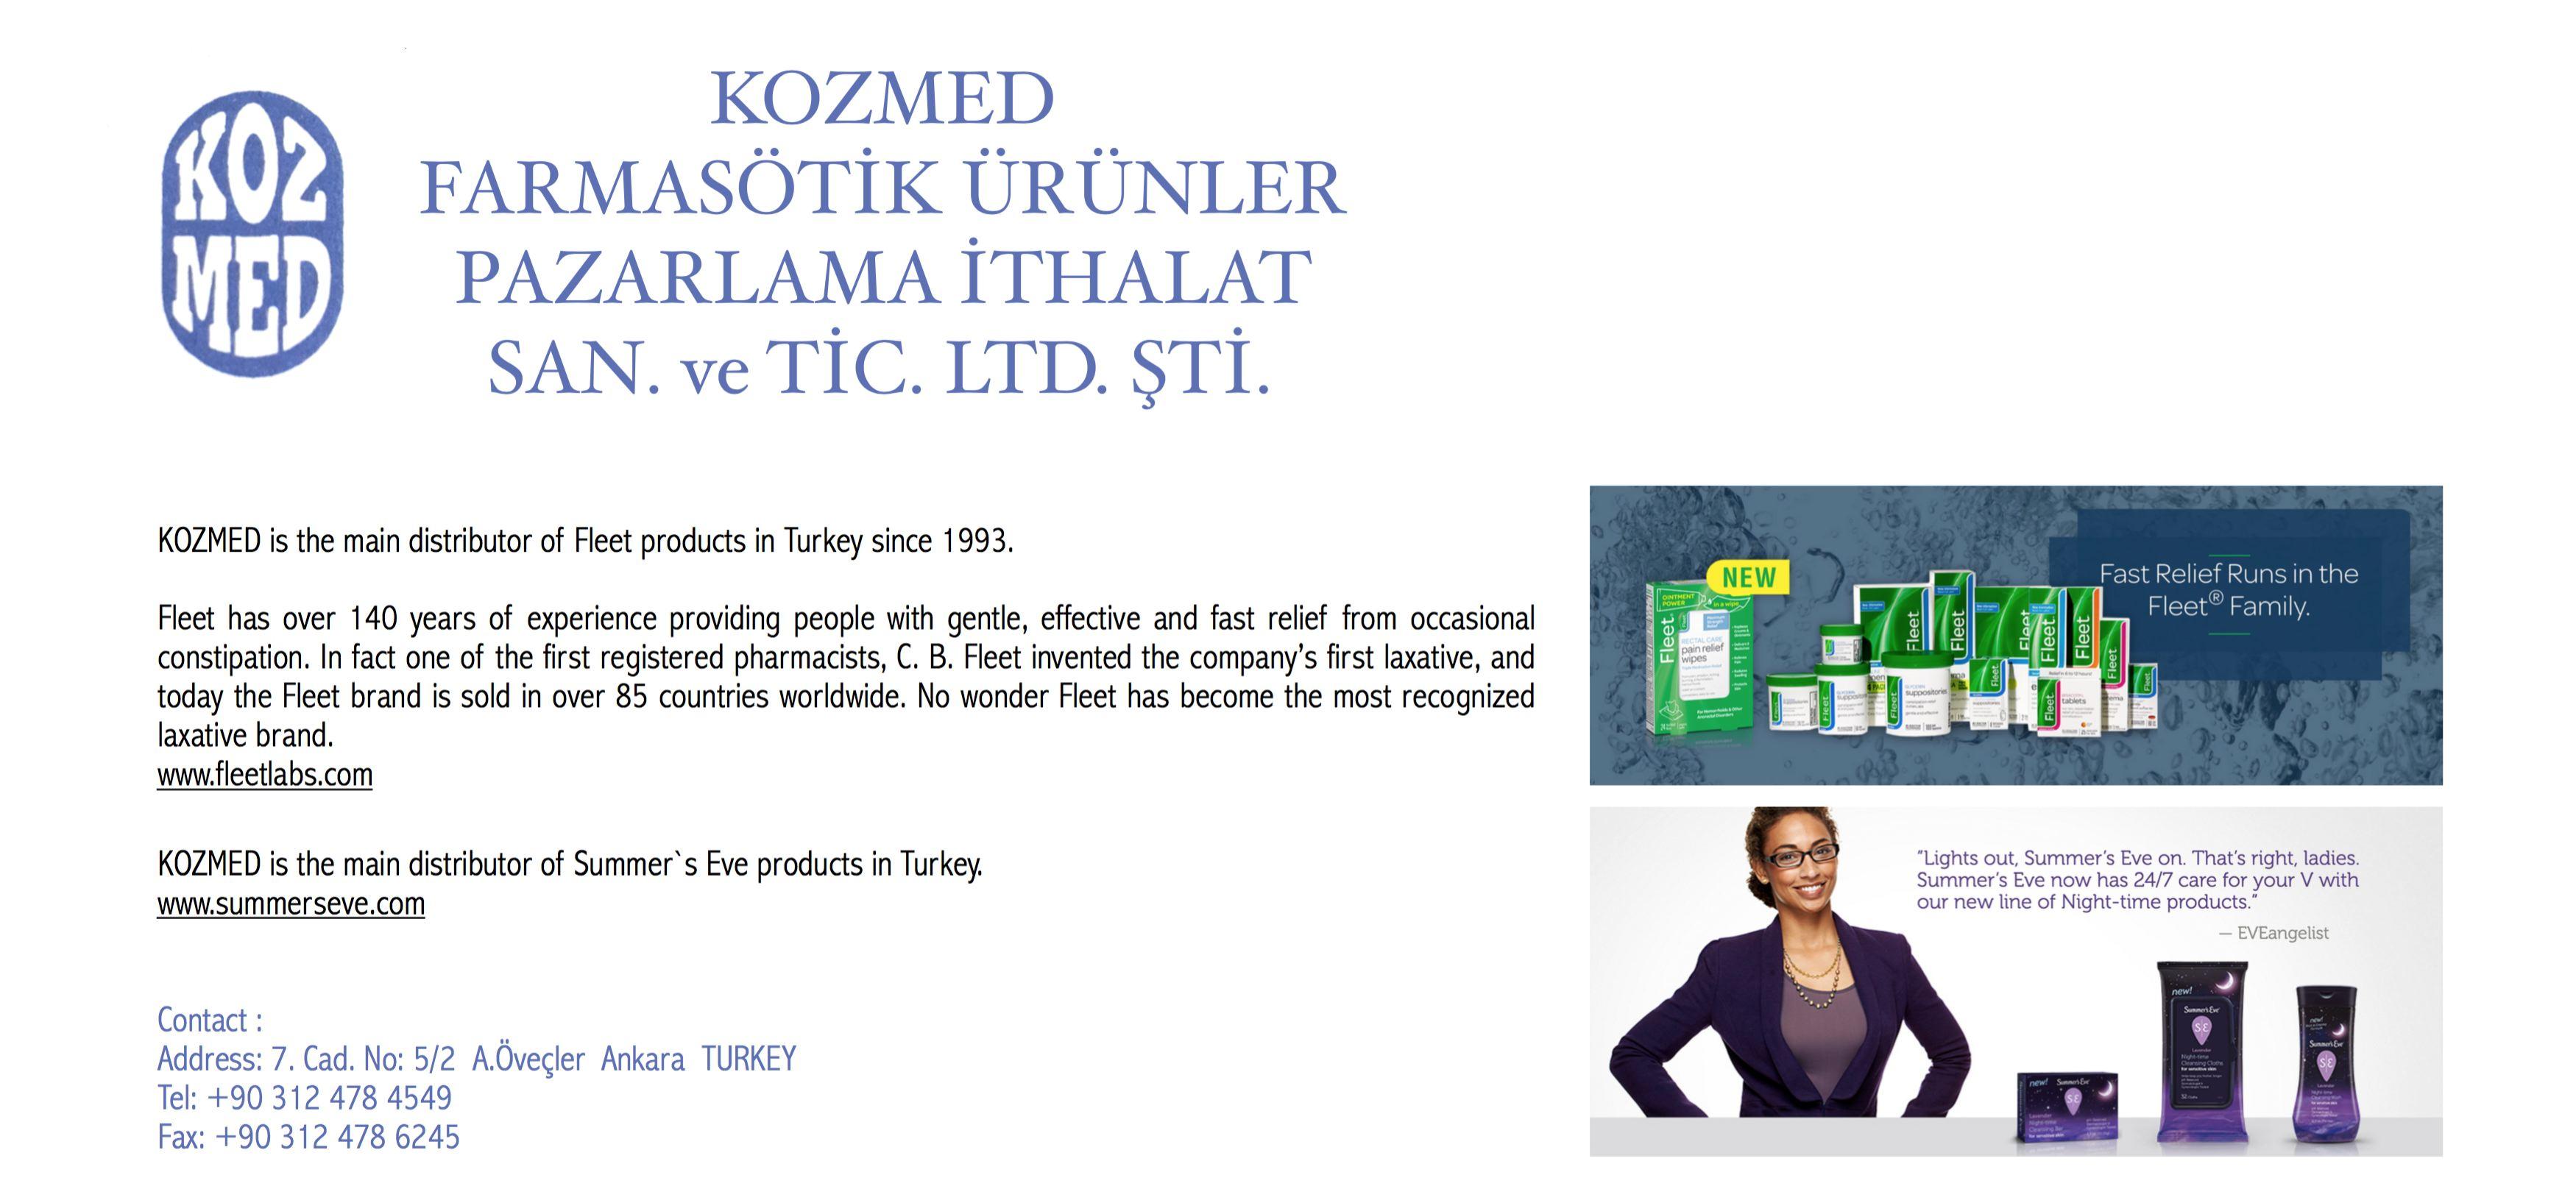 kozmed.com.tr